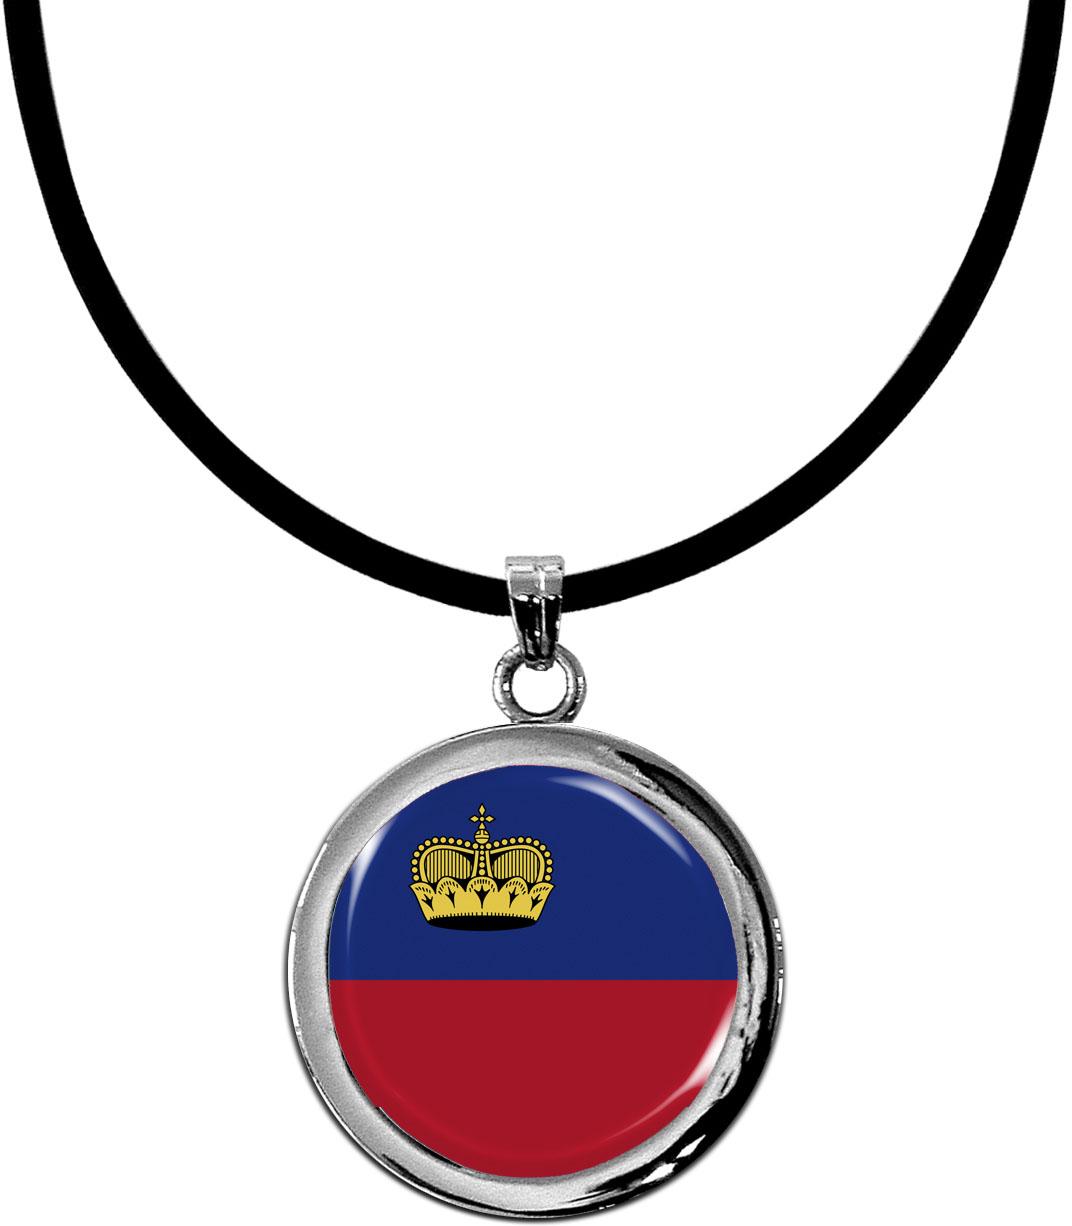 Kettenanhänger / Liechtenstein / Silikonband mit Silberverschluss